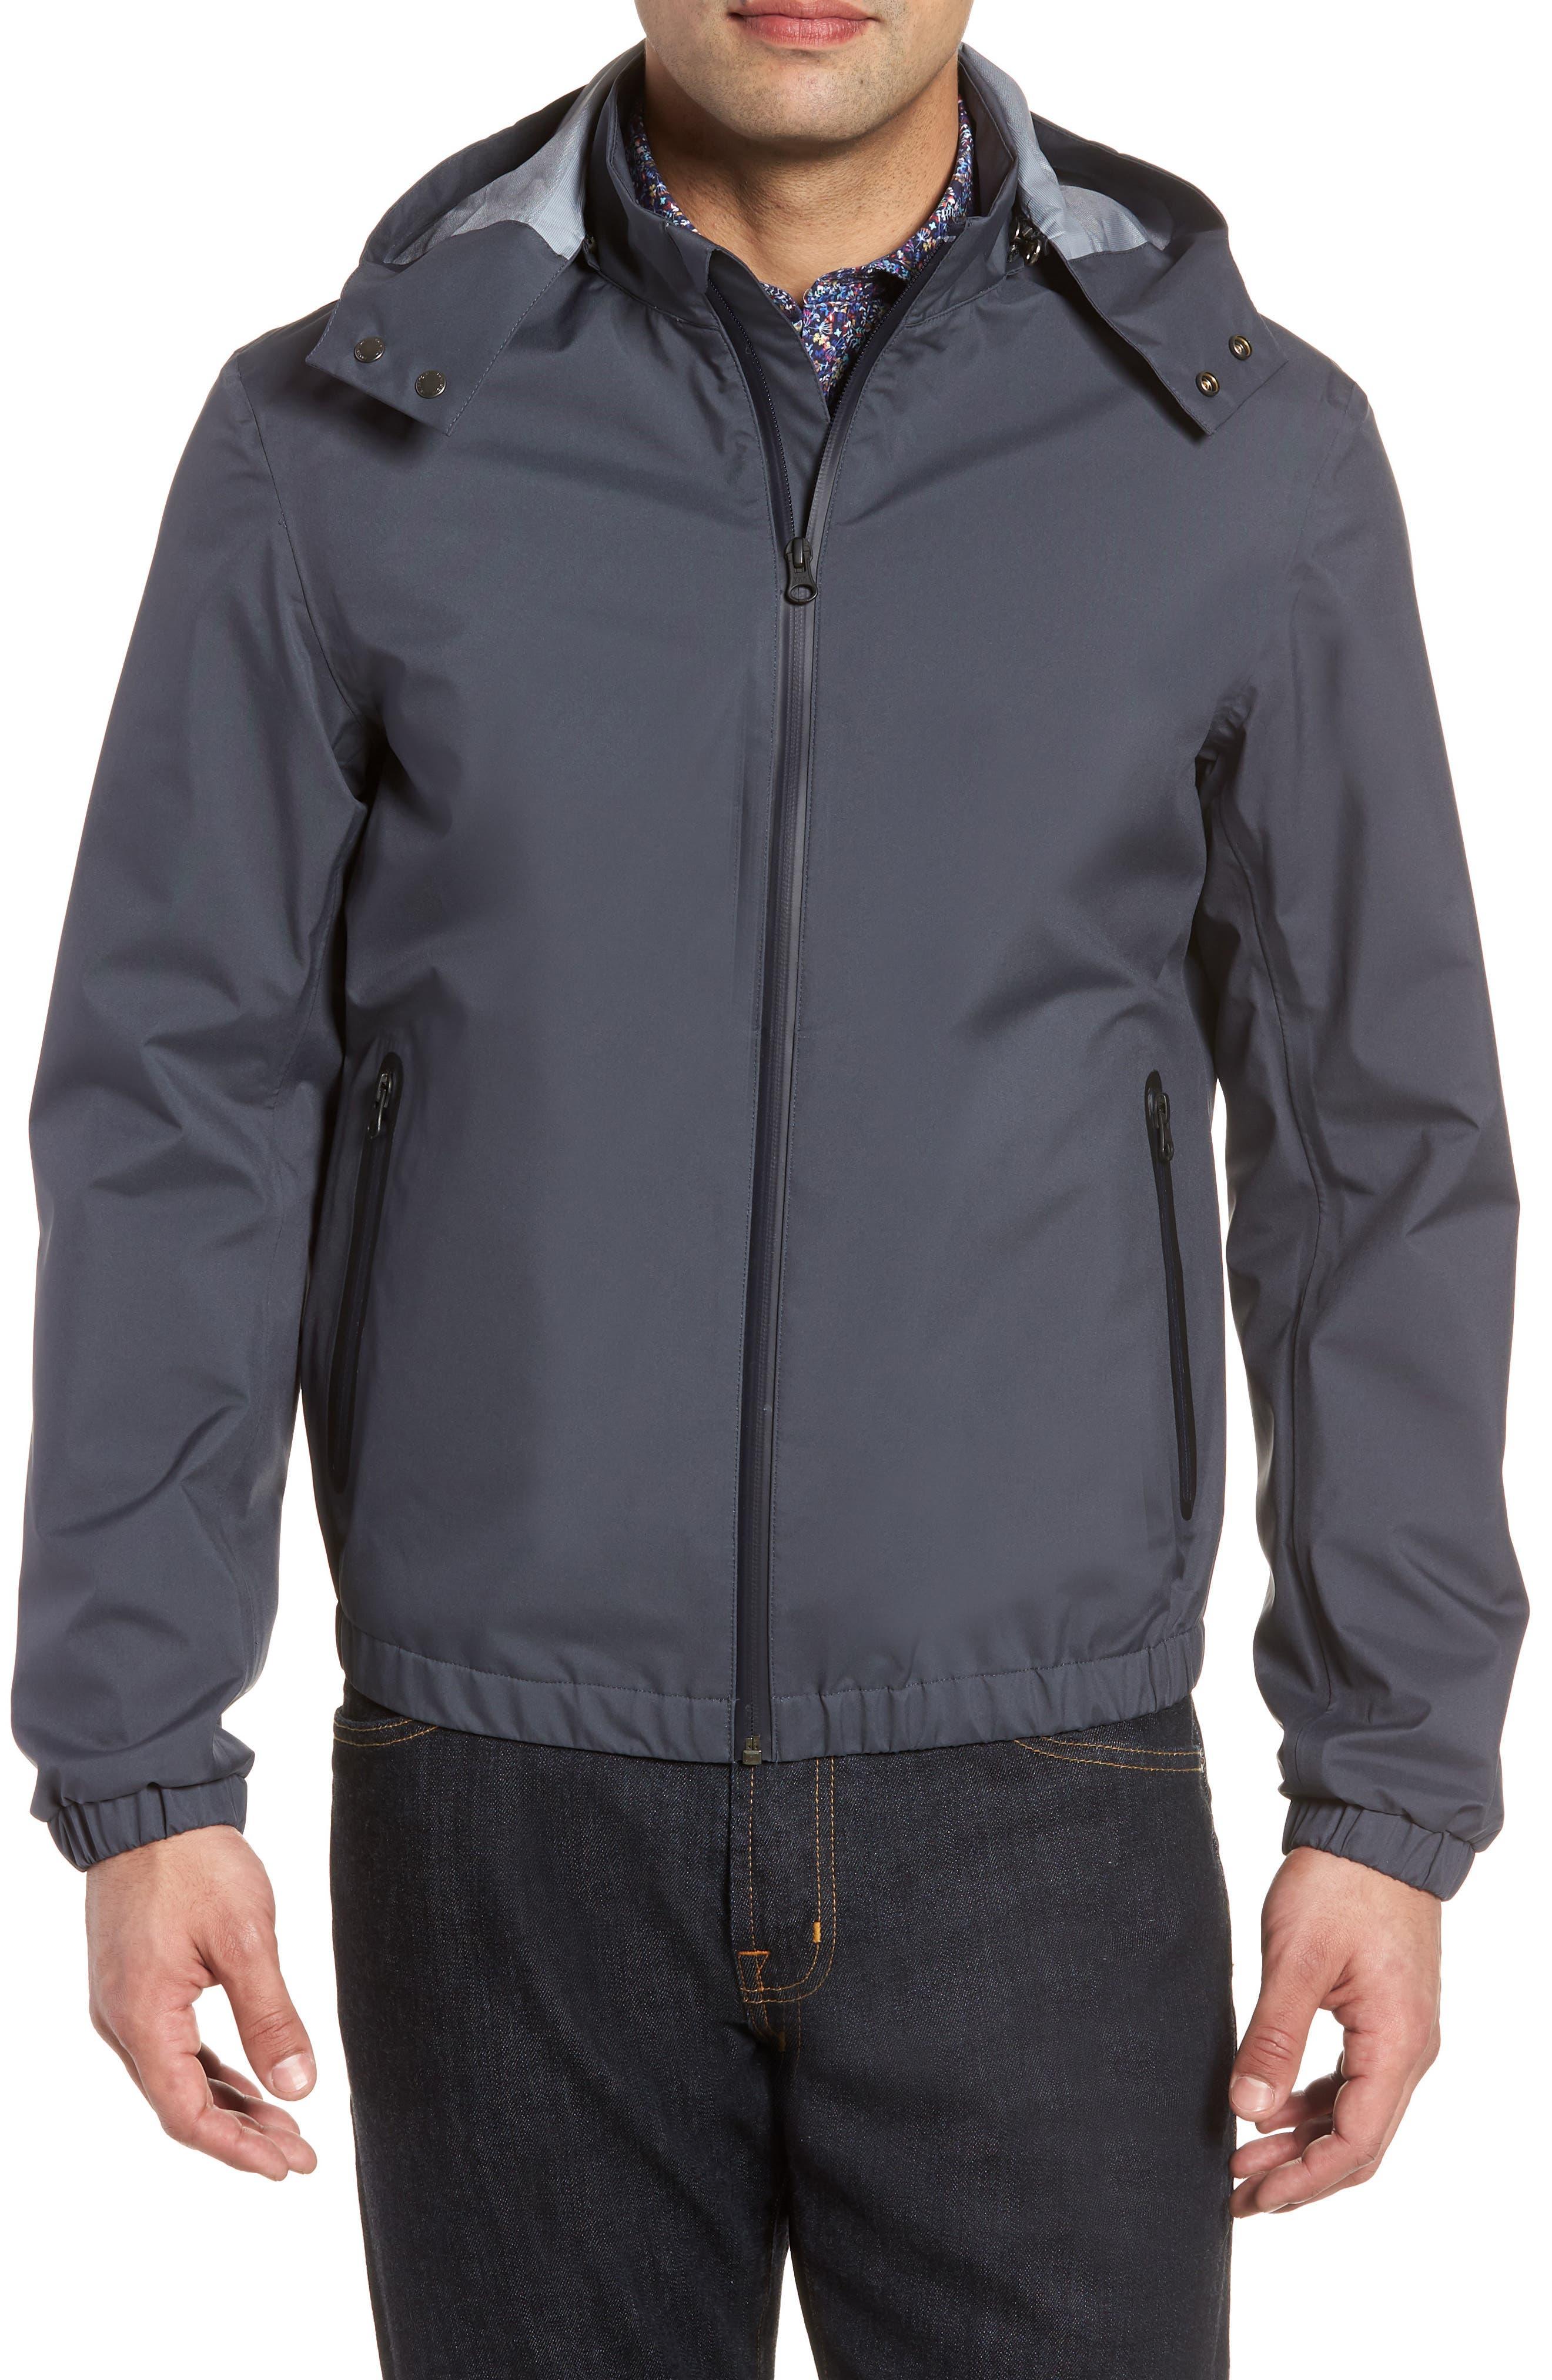 Regular Fit Jacket,                             Main thumbnail 1, color,                             020